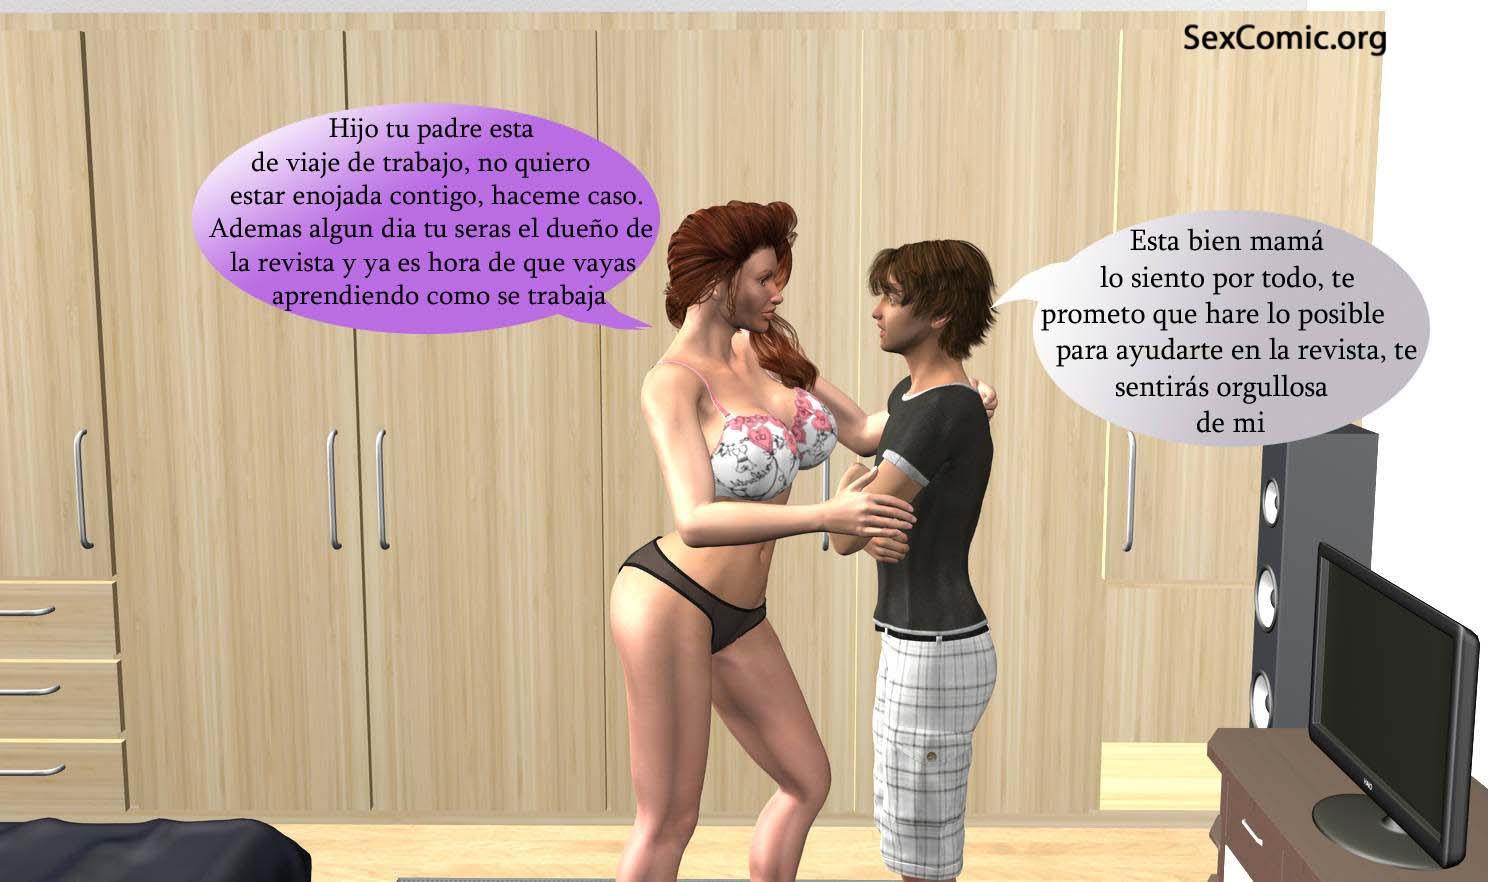 comic-xxx-3d-seduciendo-alas-empleadas-de-mama-historias-sexuales-mangas-para-adultos-videos-deincesto-comics-xxx-historias-eroticas-fantacias-sexuales-gtaris-online-16